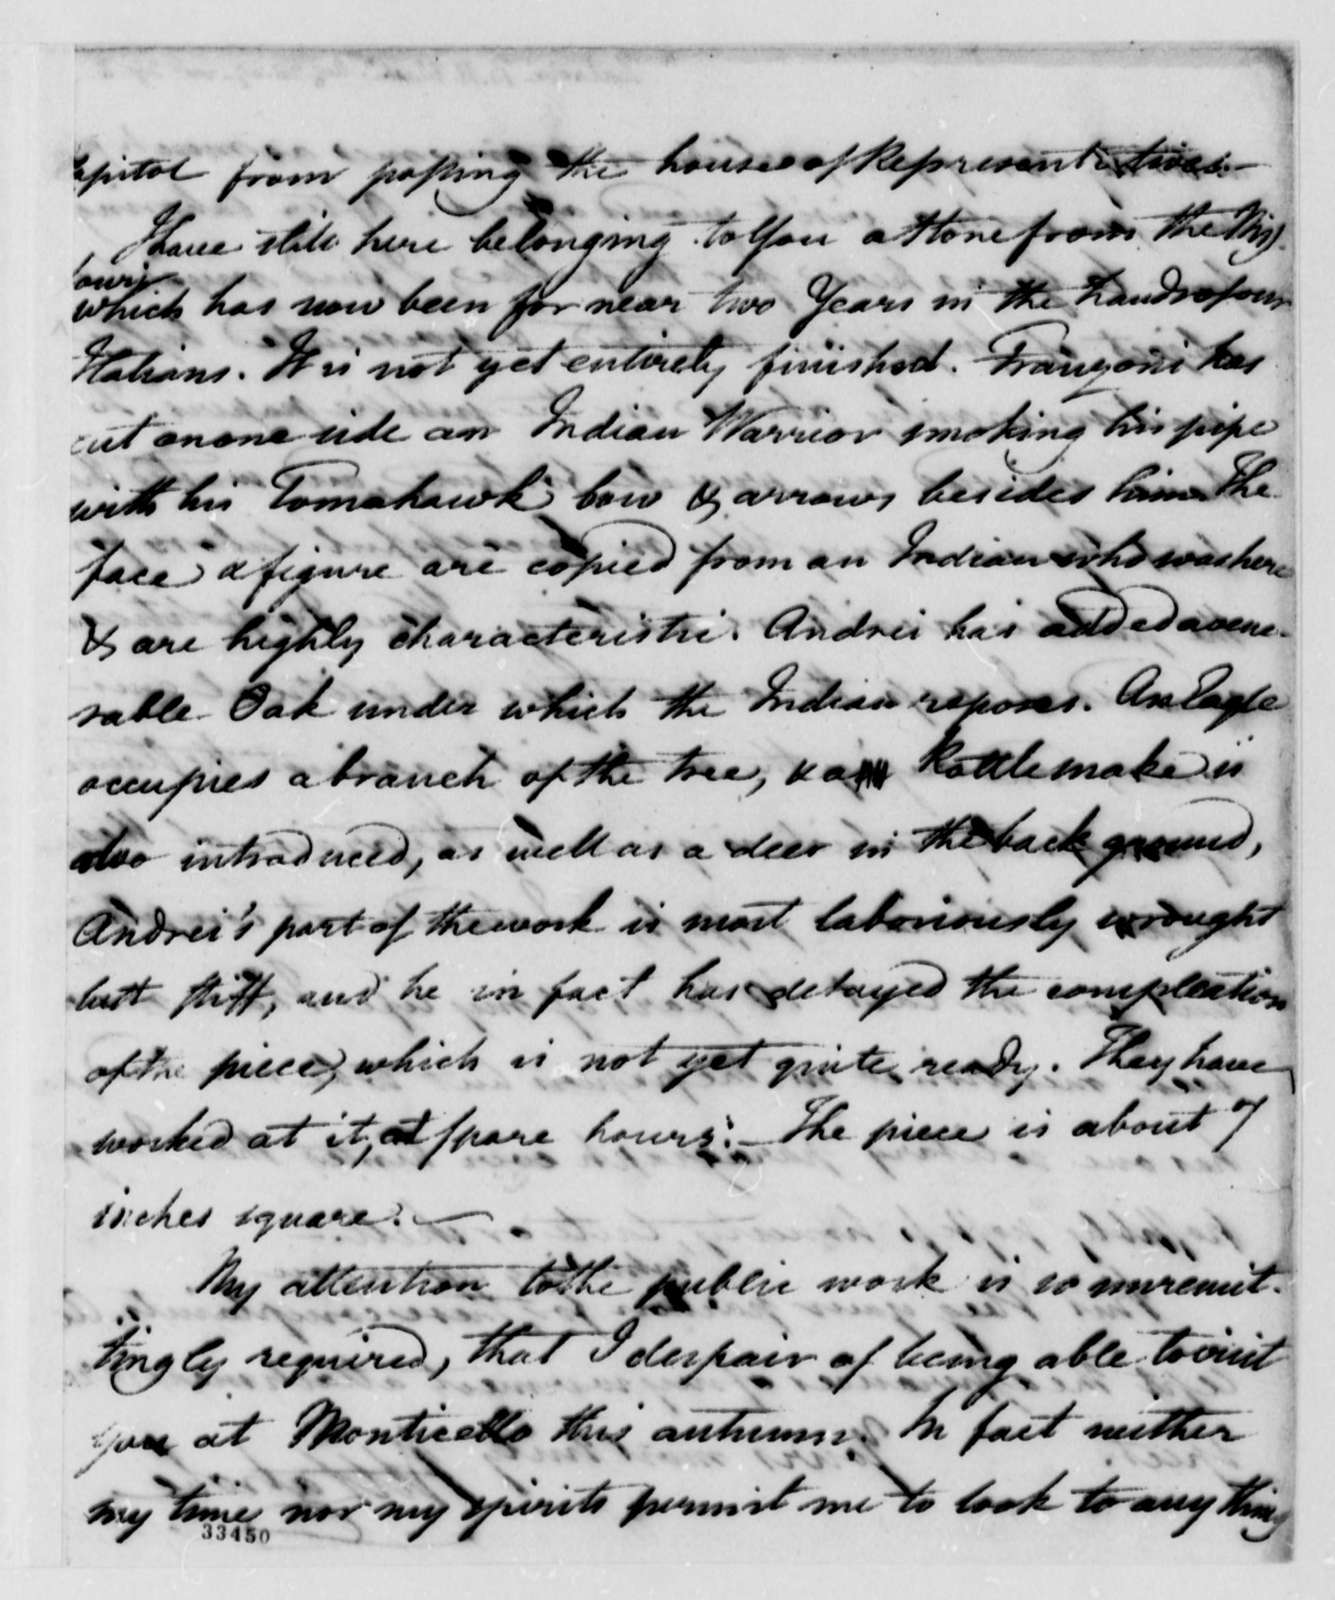 Benjamin H. Latrobe to Thomas Jefferson, August 28, 1809